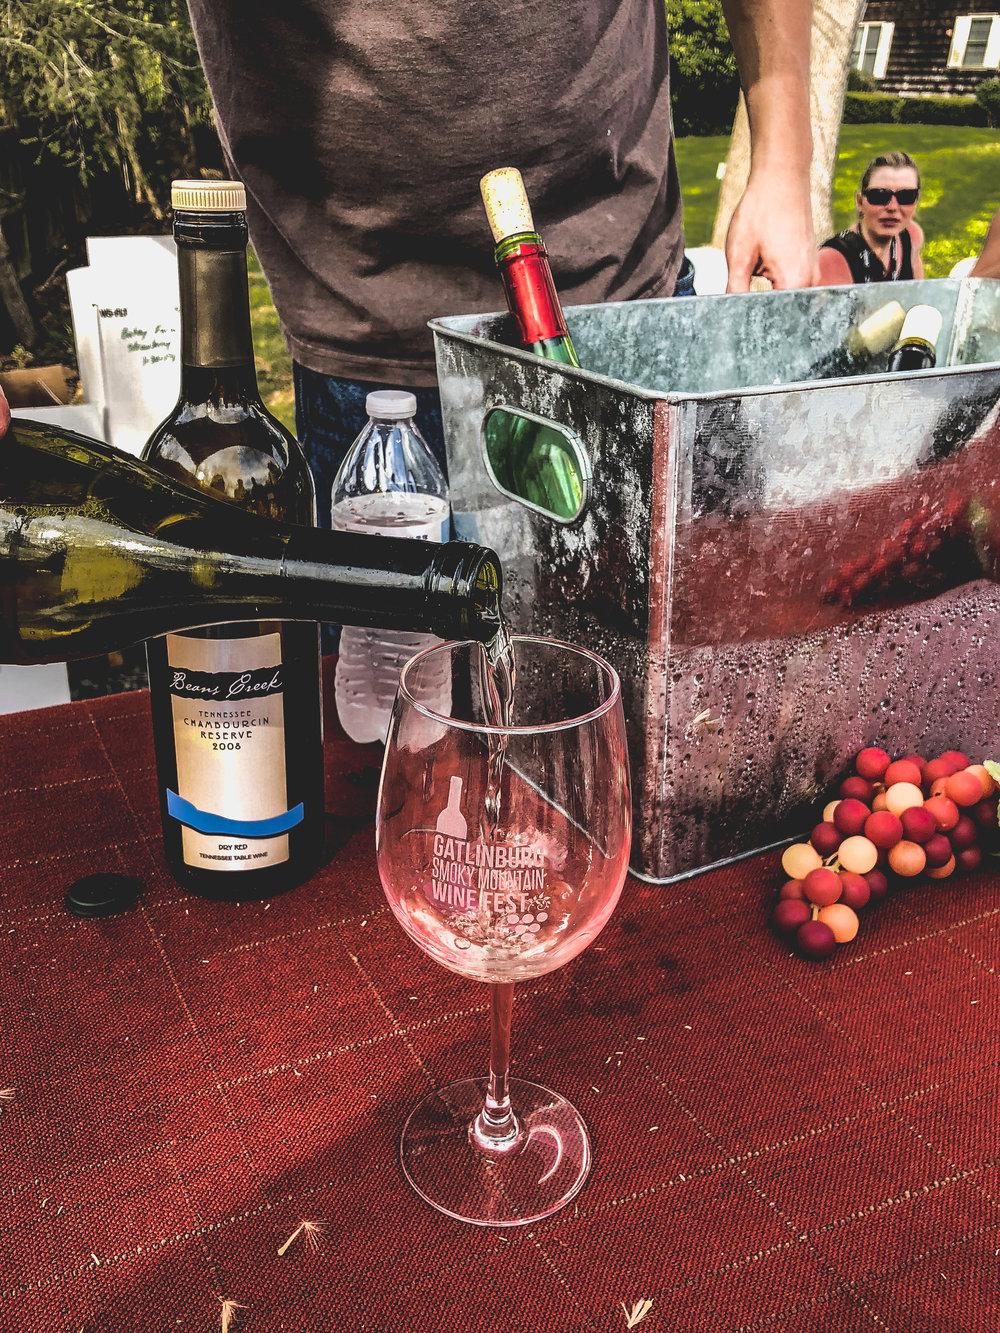 gatlinburg-tennessee-winefest-1-of-1-5.jpg